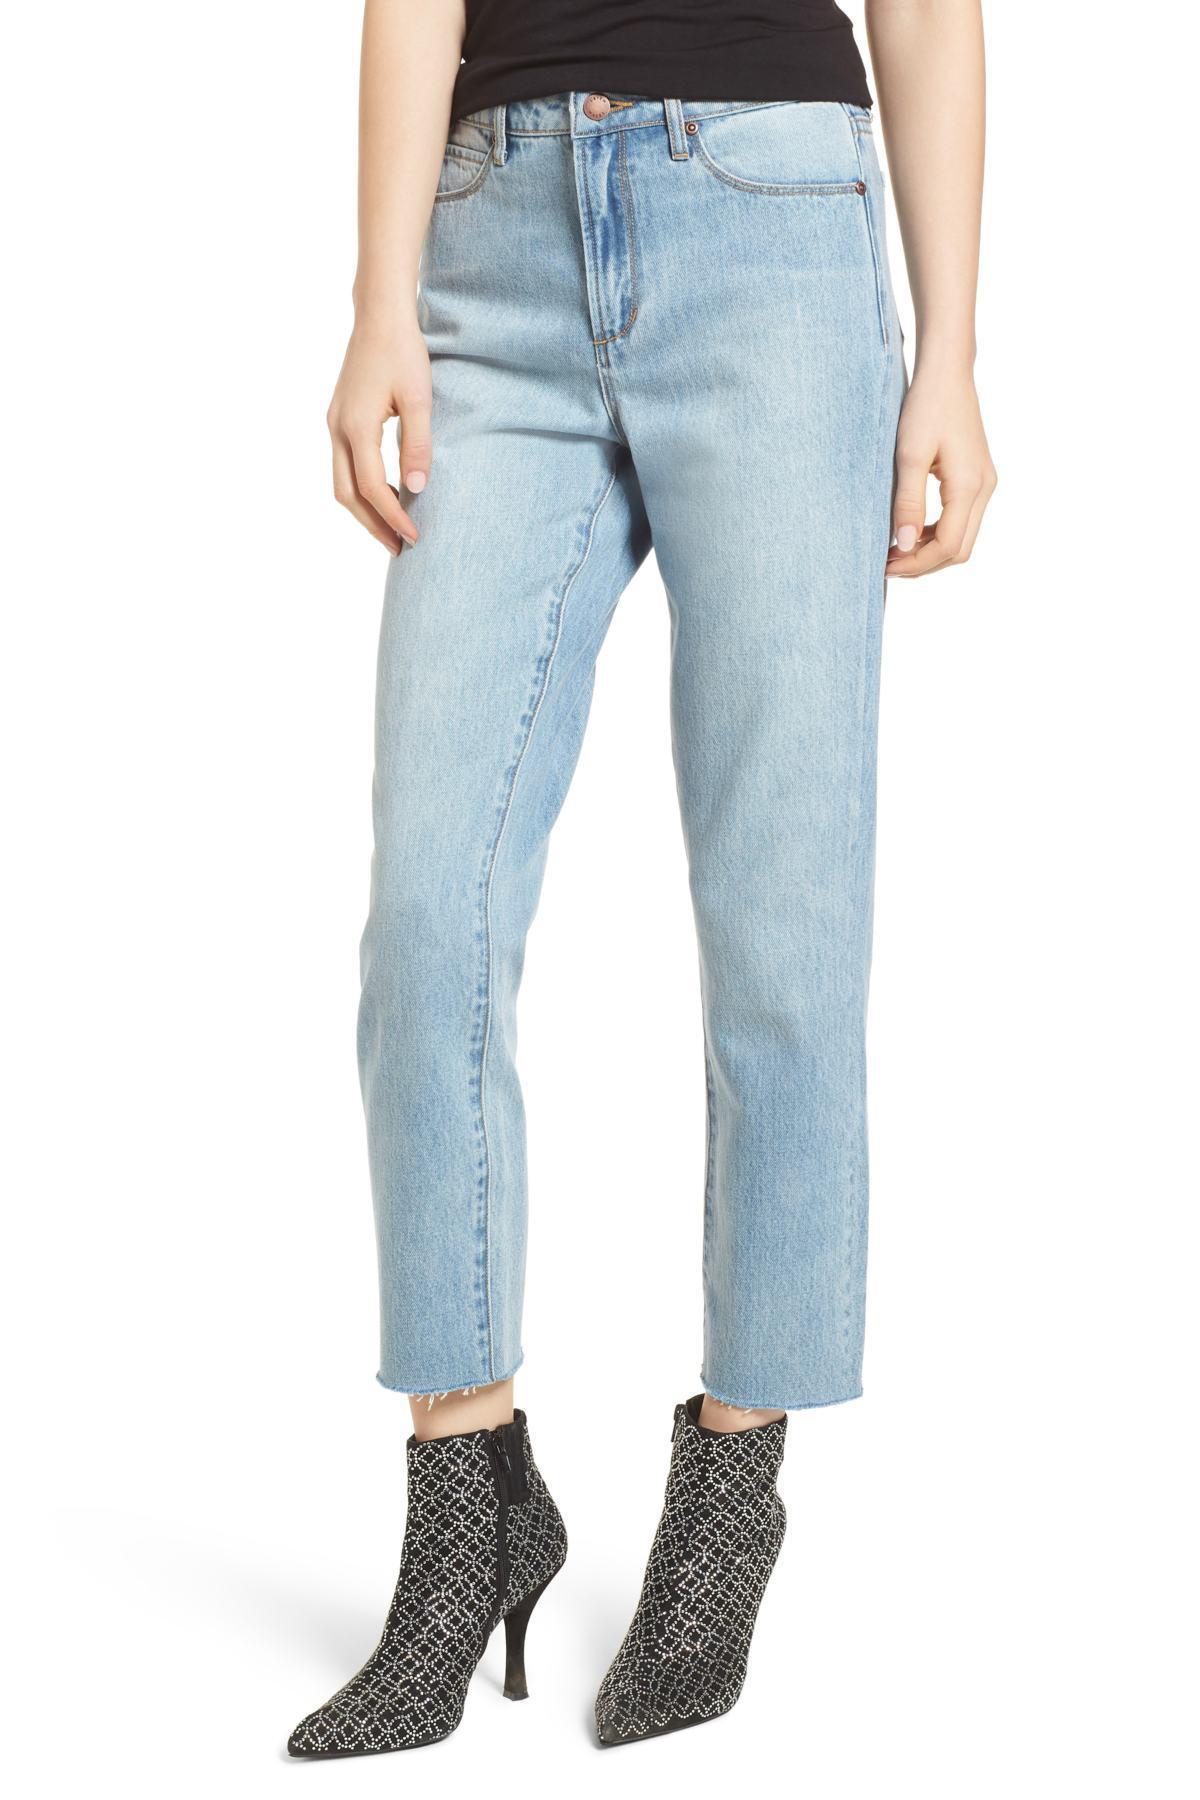 a0ad2d701 Leith High Waist Crop Straight Leg Jeans in Blue - Lyst